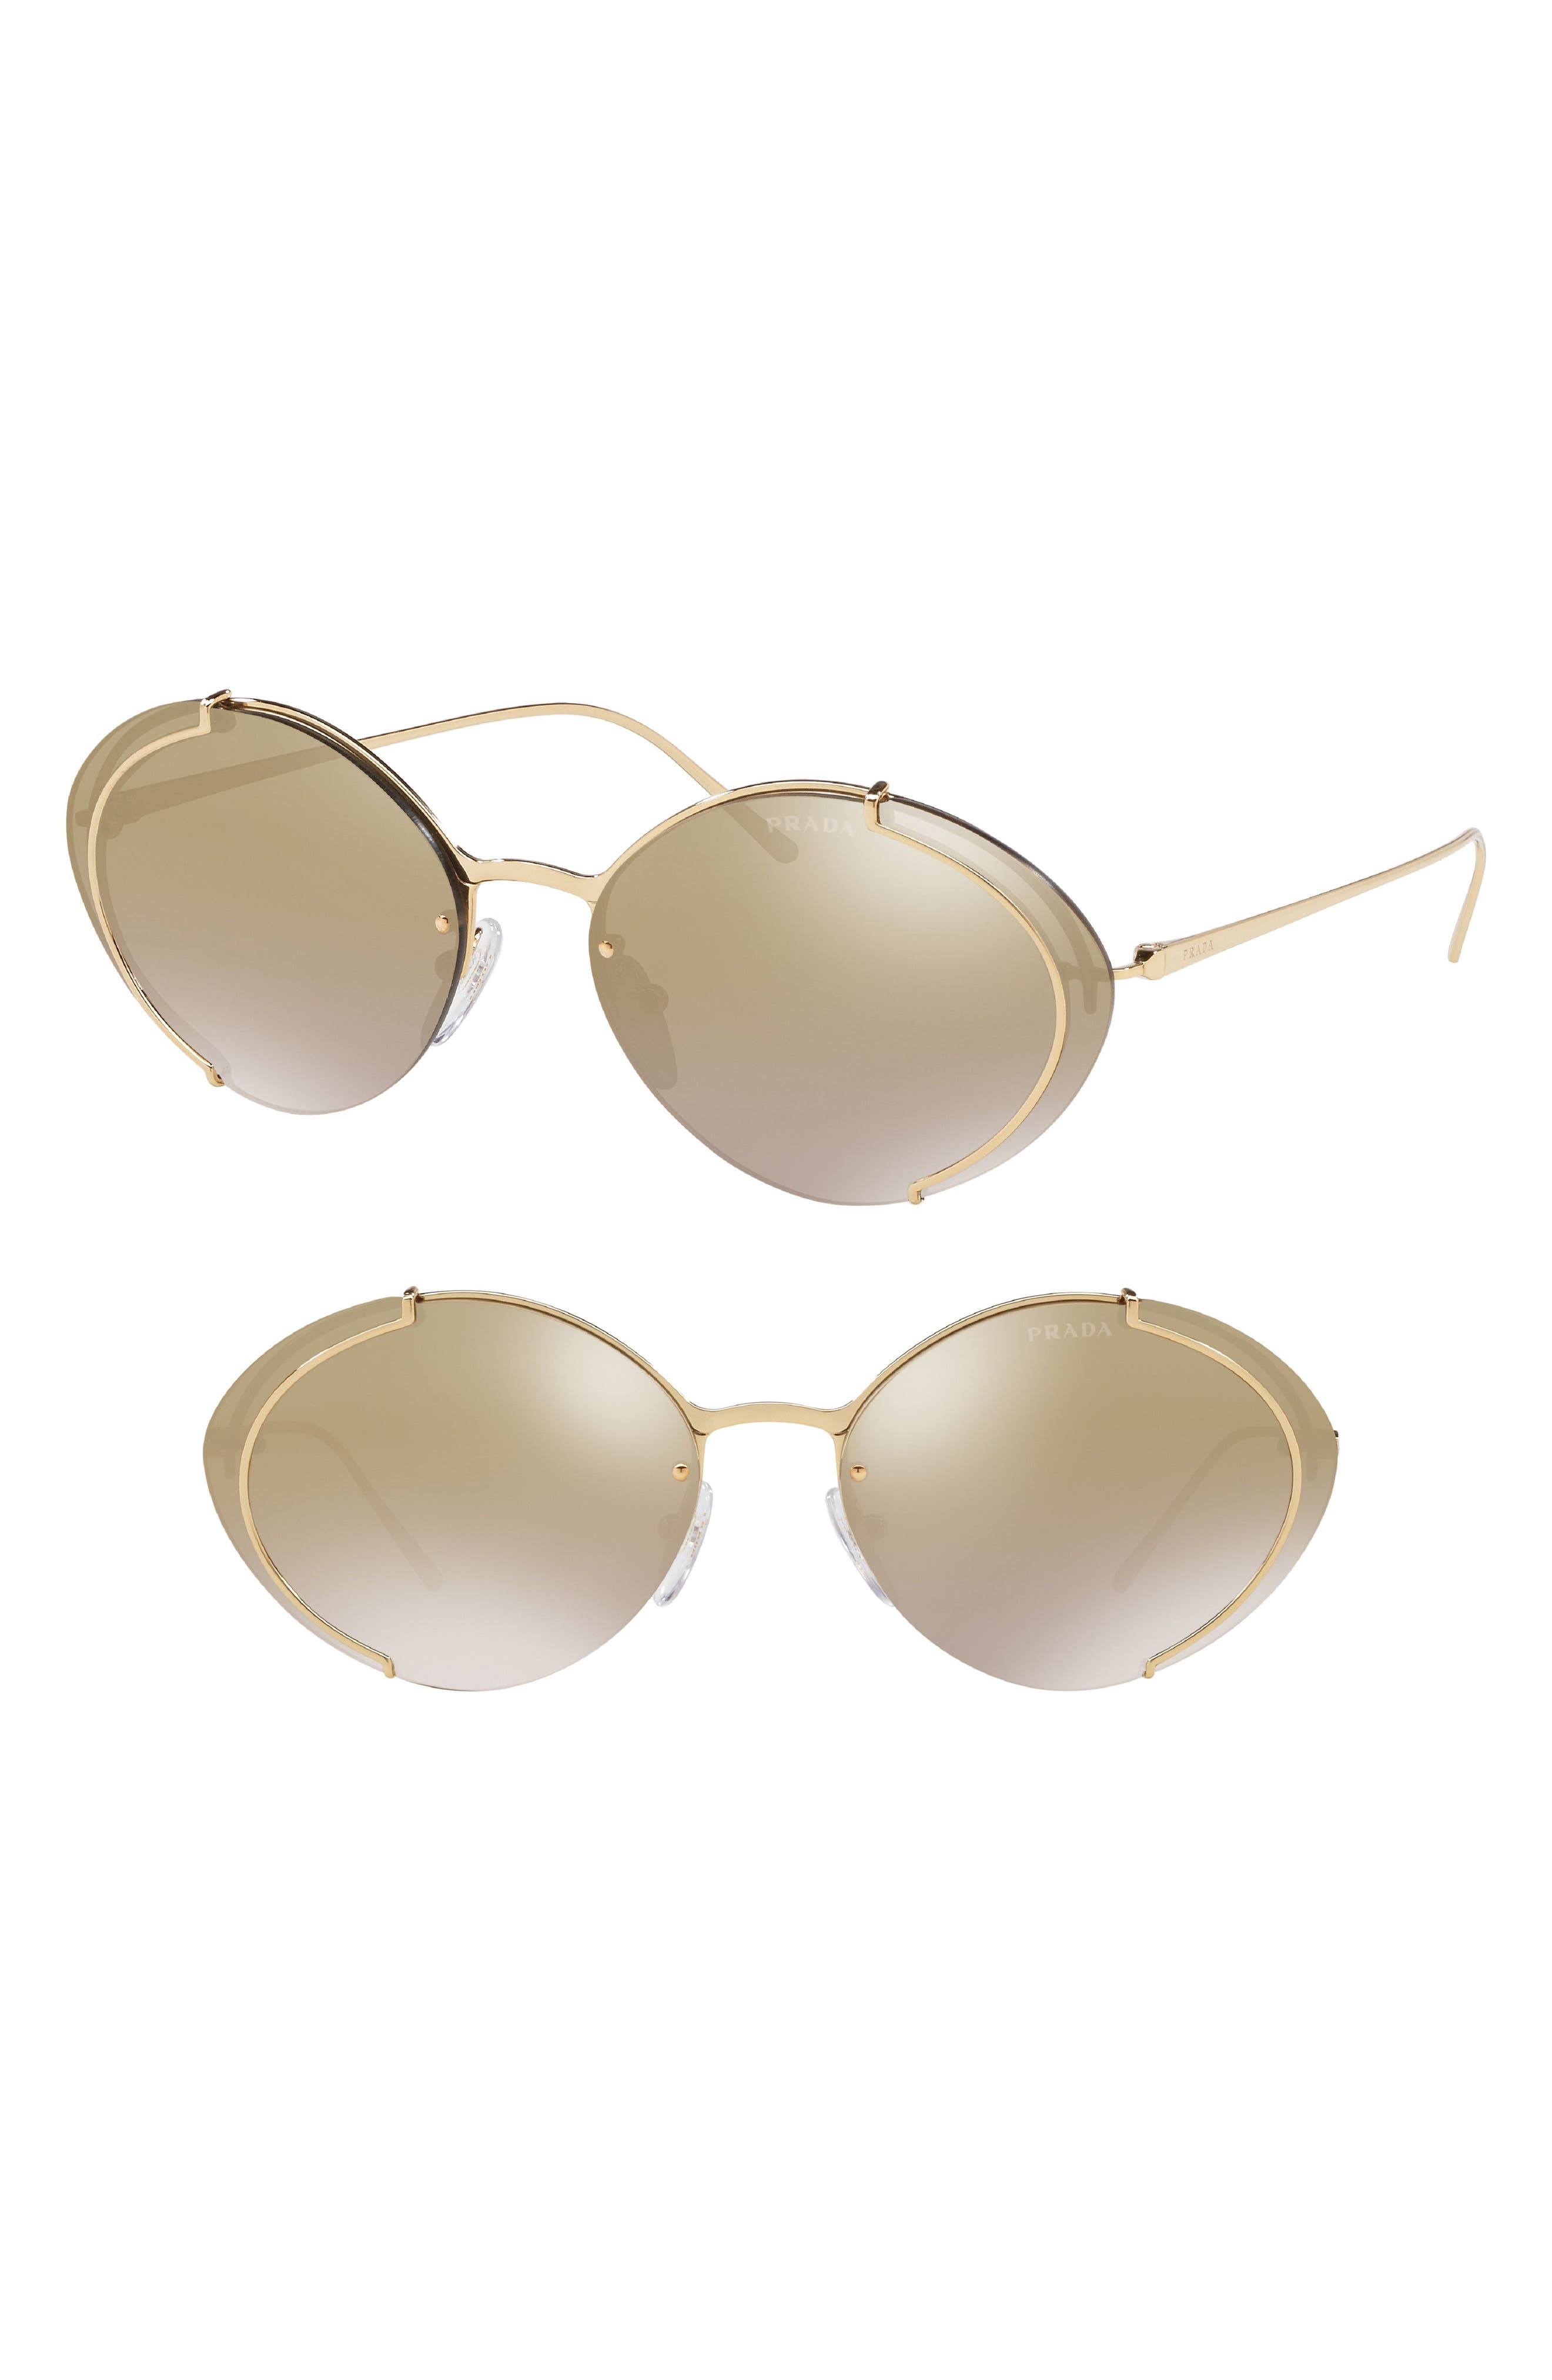 Evolution 63mm Oversize Rimless Oval Sunglasses,                         Main,                         color, GOLD GRADIENT MIRROR